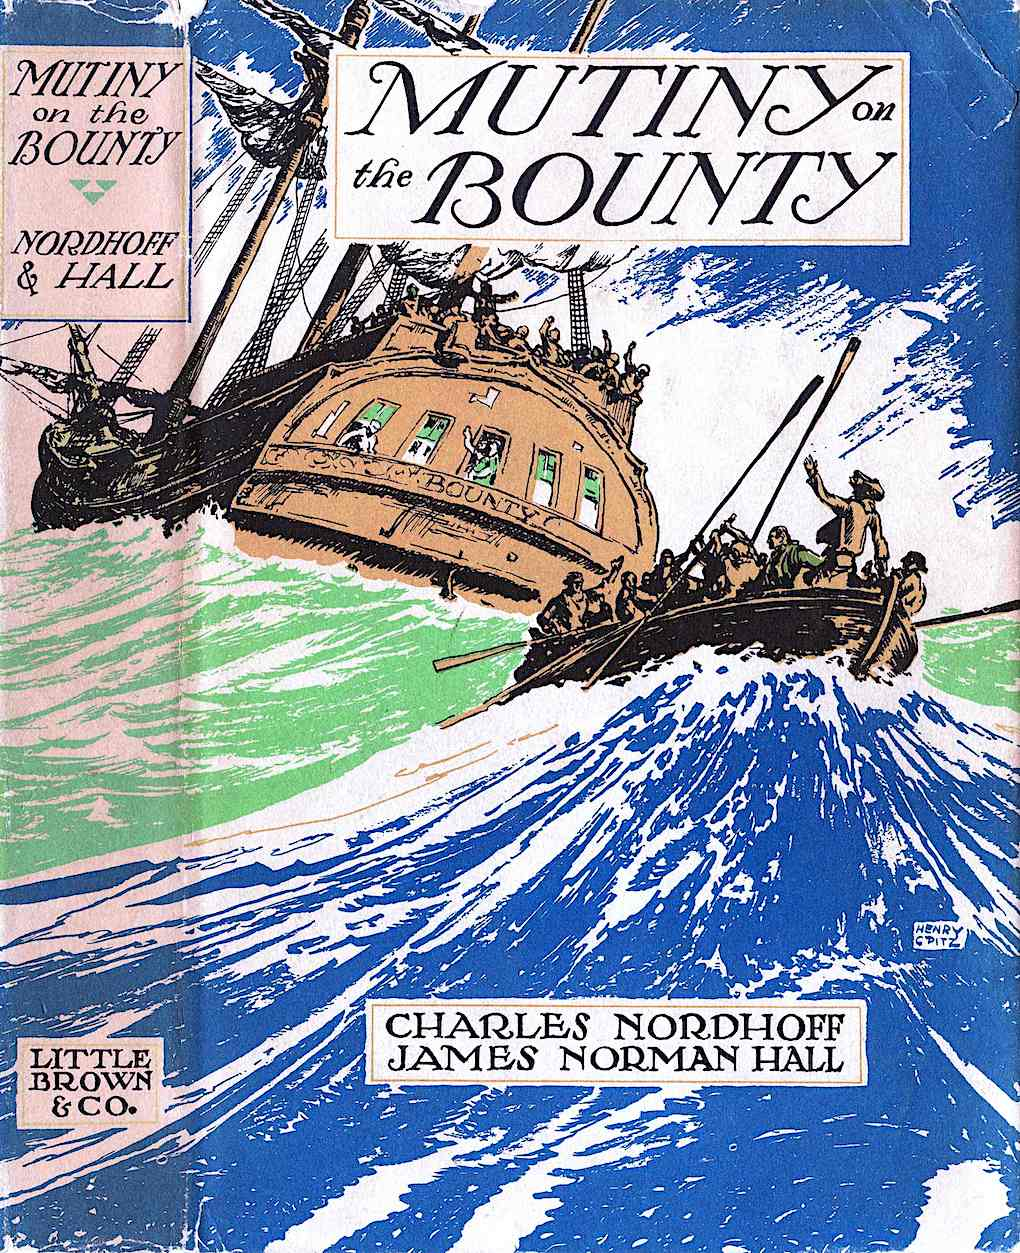 a Henry C. Pitz book jacket illustration for Mutiny on the Bounty